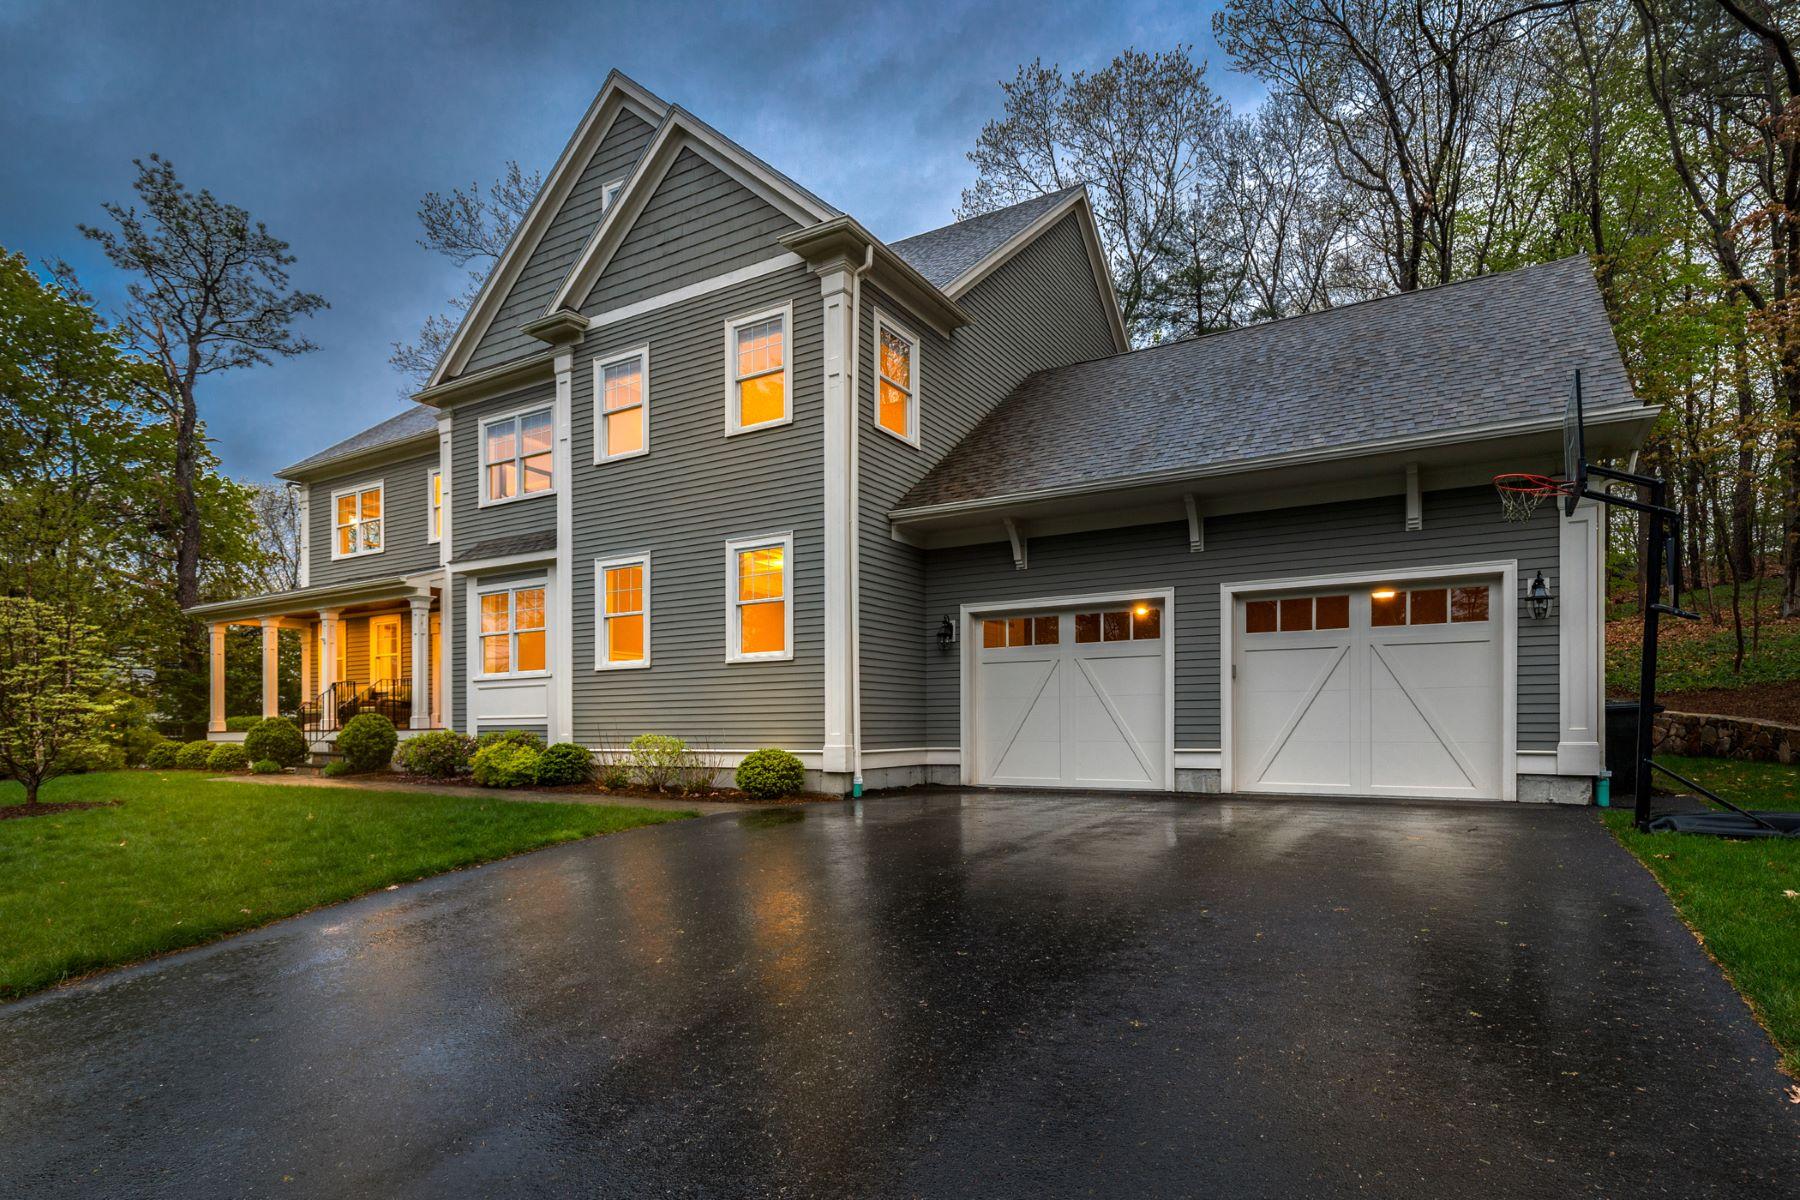 Single Family Home for Active at 6 Flintlock Road, Lexington 6 Flintlock Rd Lexington, Massachusetts 02420 United States